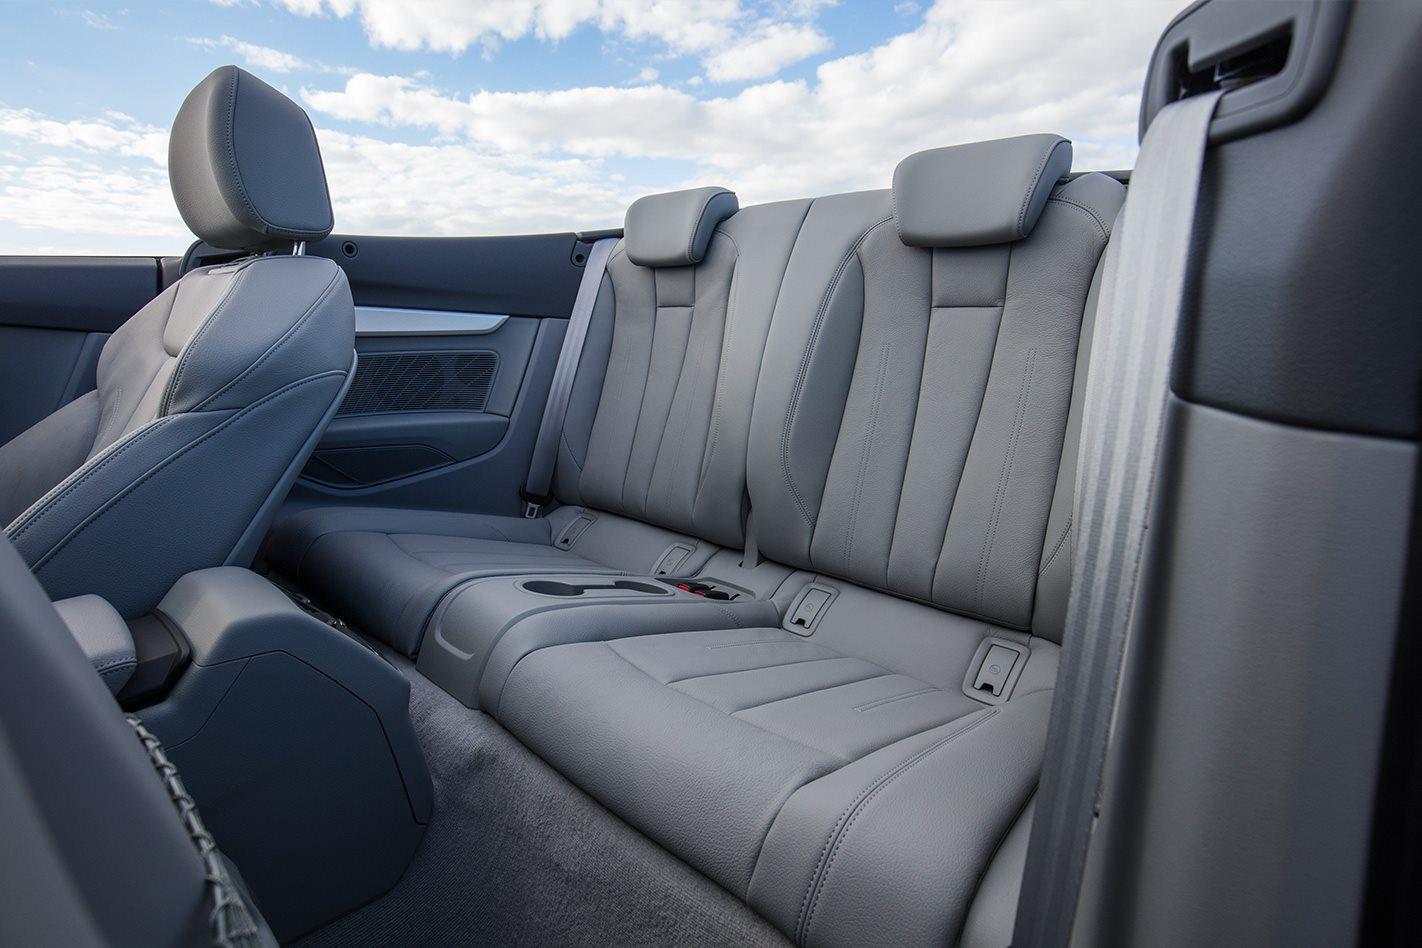 Audi A5 Cabriolet 2 0 Tfsi Quattro Sport Review